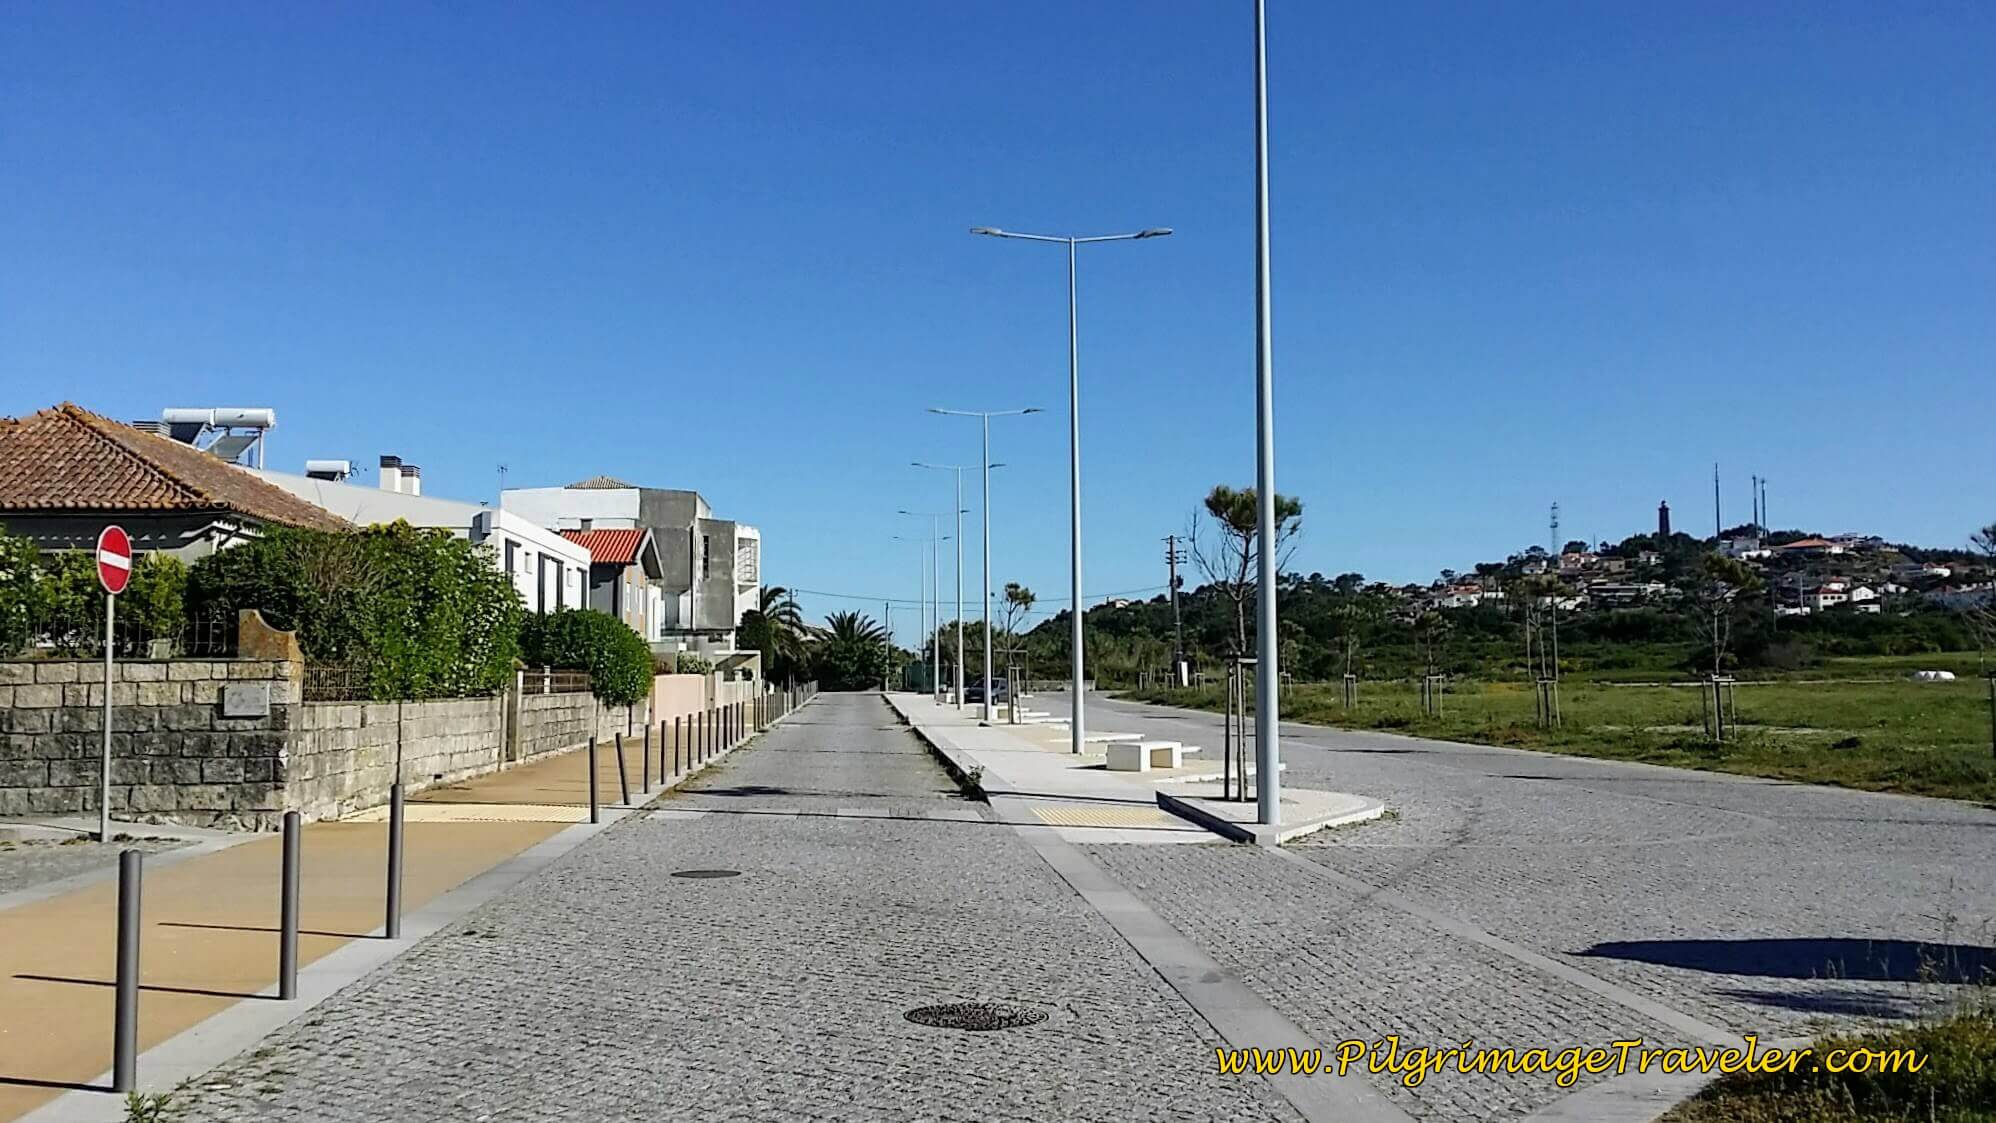 Walking Throught Carreço on day eighteen of the Camino Portugués on the Senda Litoral